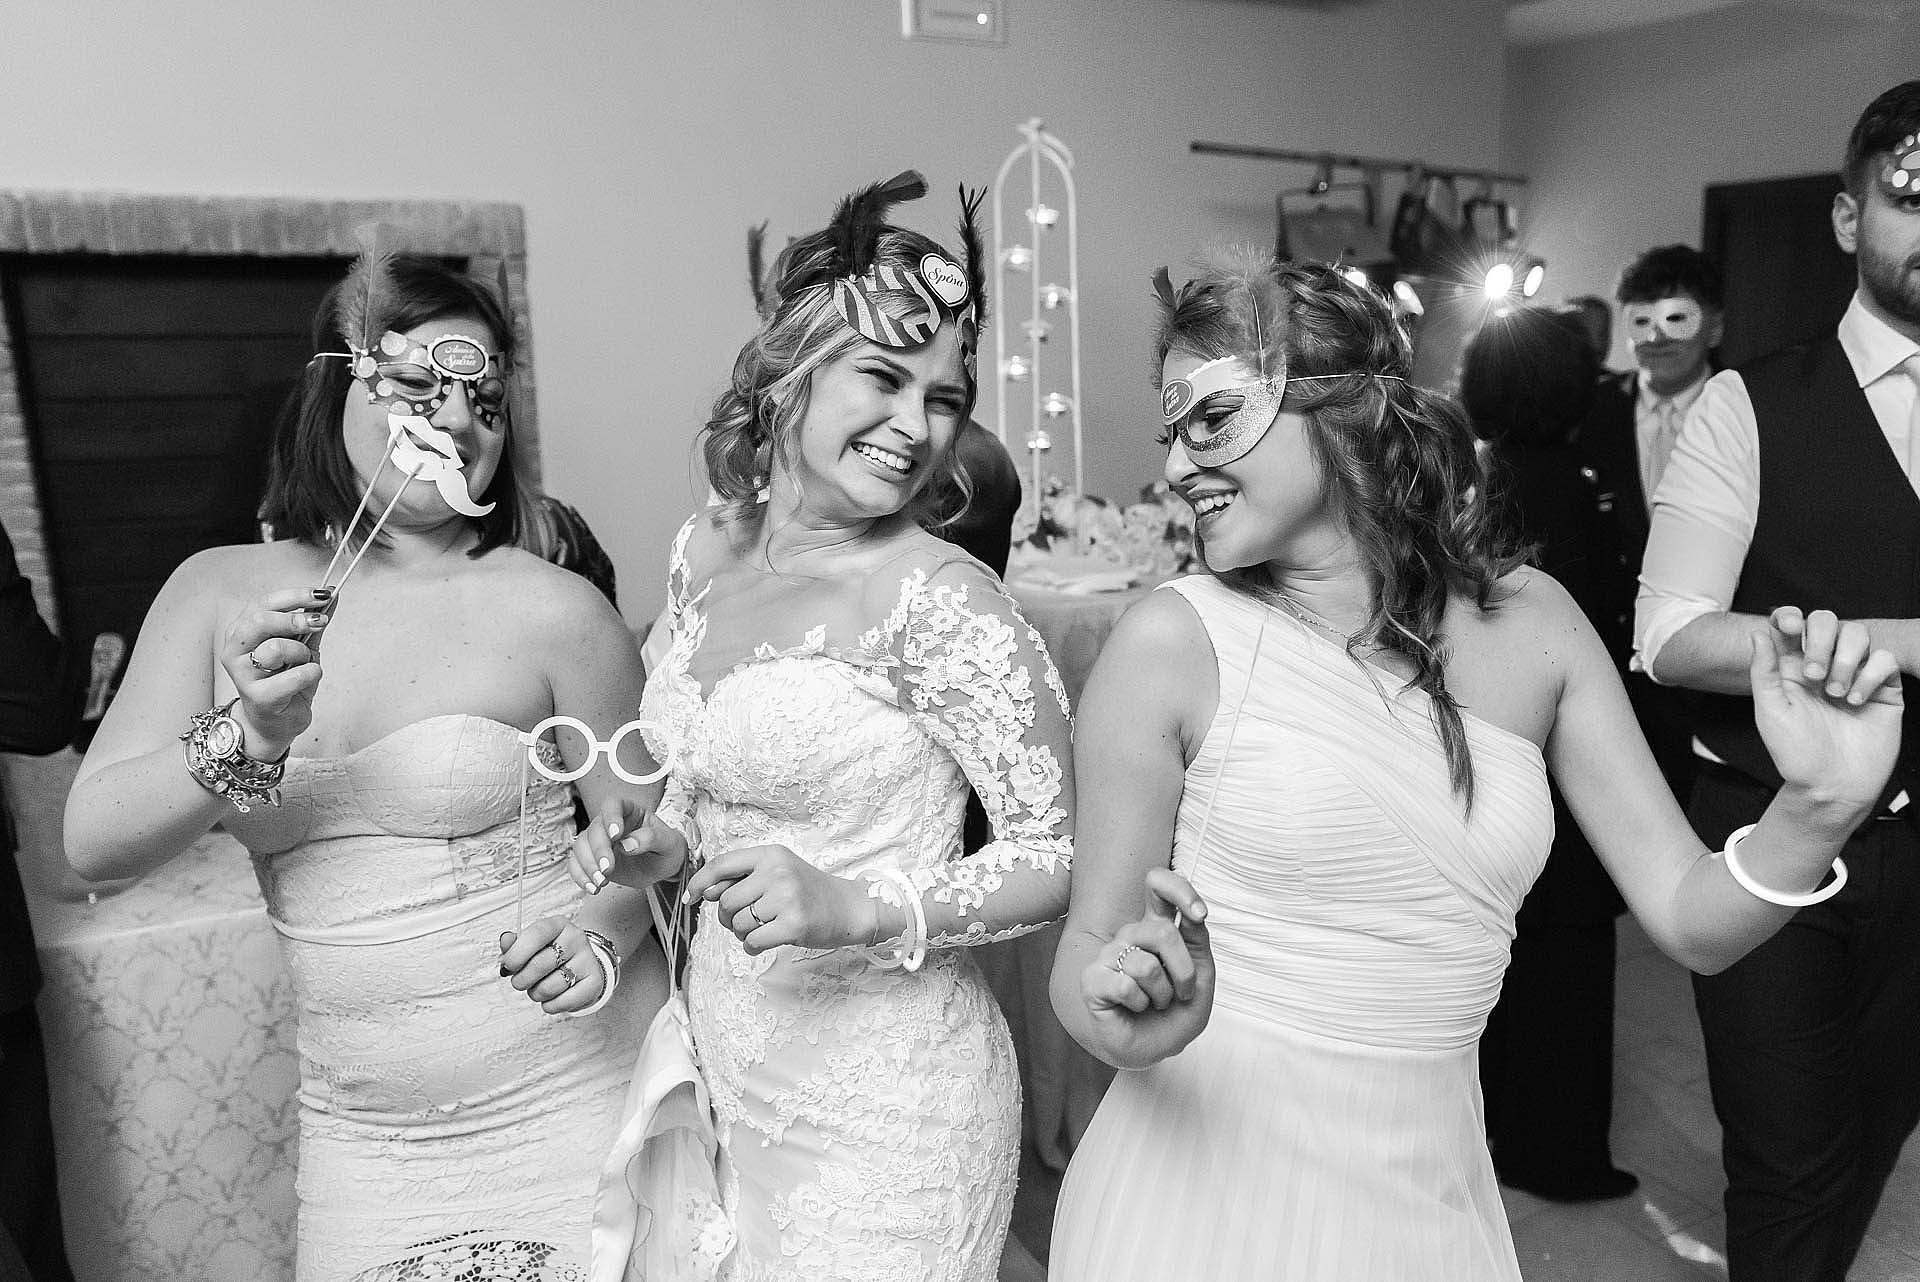 foto-festa-matrimonio-roma-5